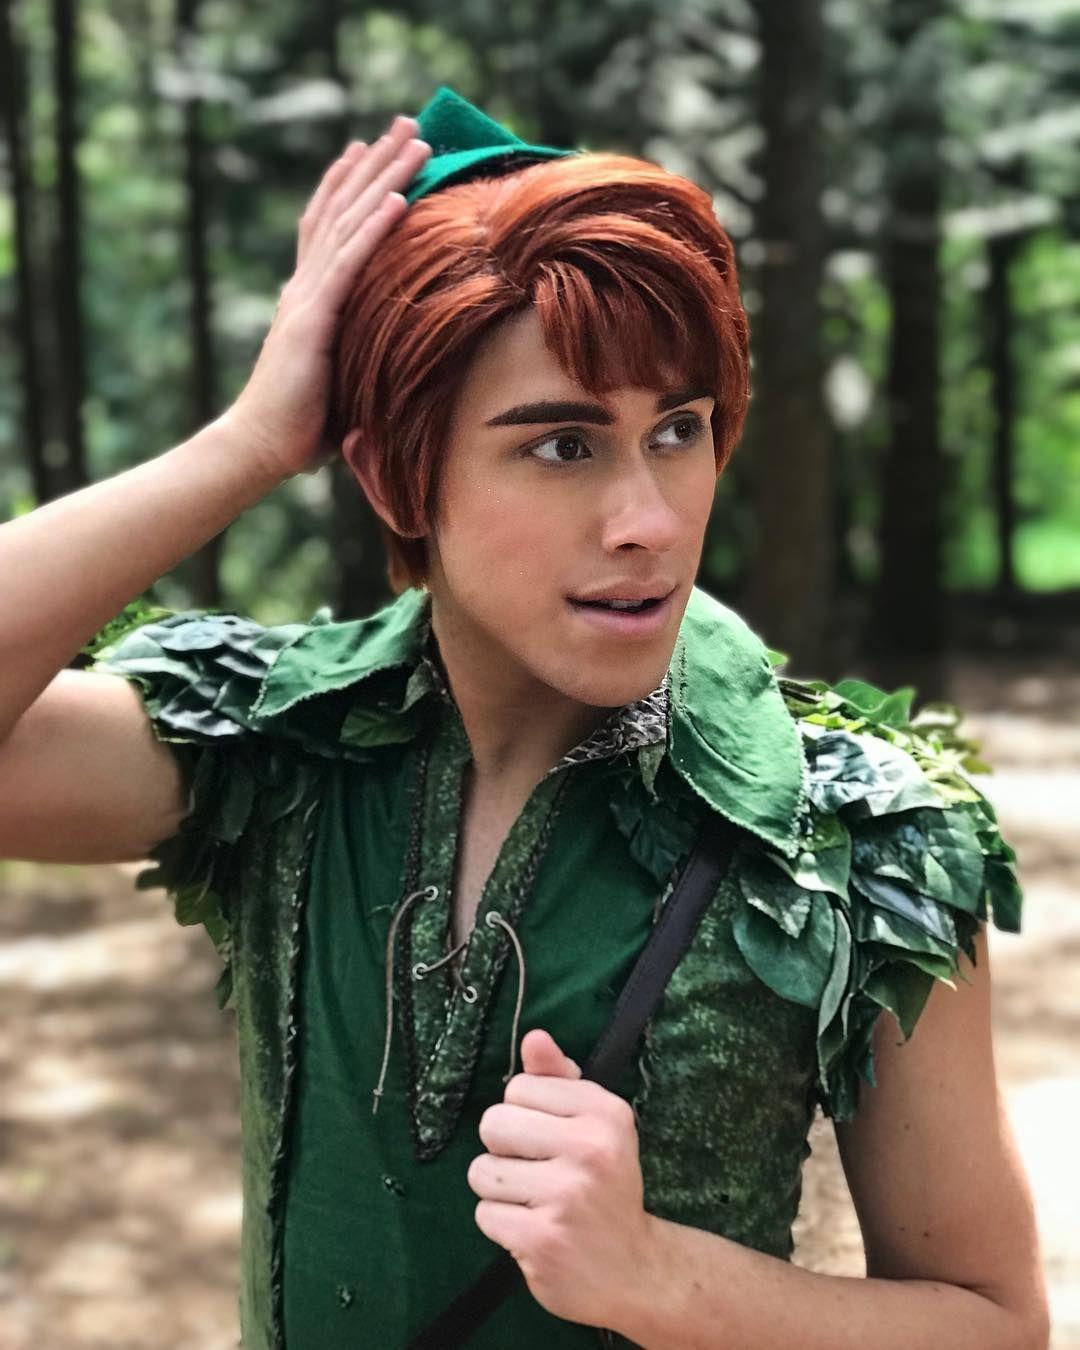 Robin Hood Hut Peter Pan Jäger Girl Kostüm Kleid Damen Herren Kinder Mittelalter